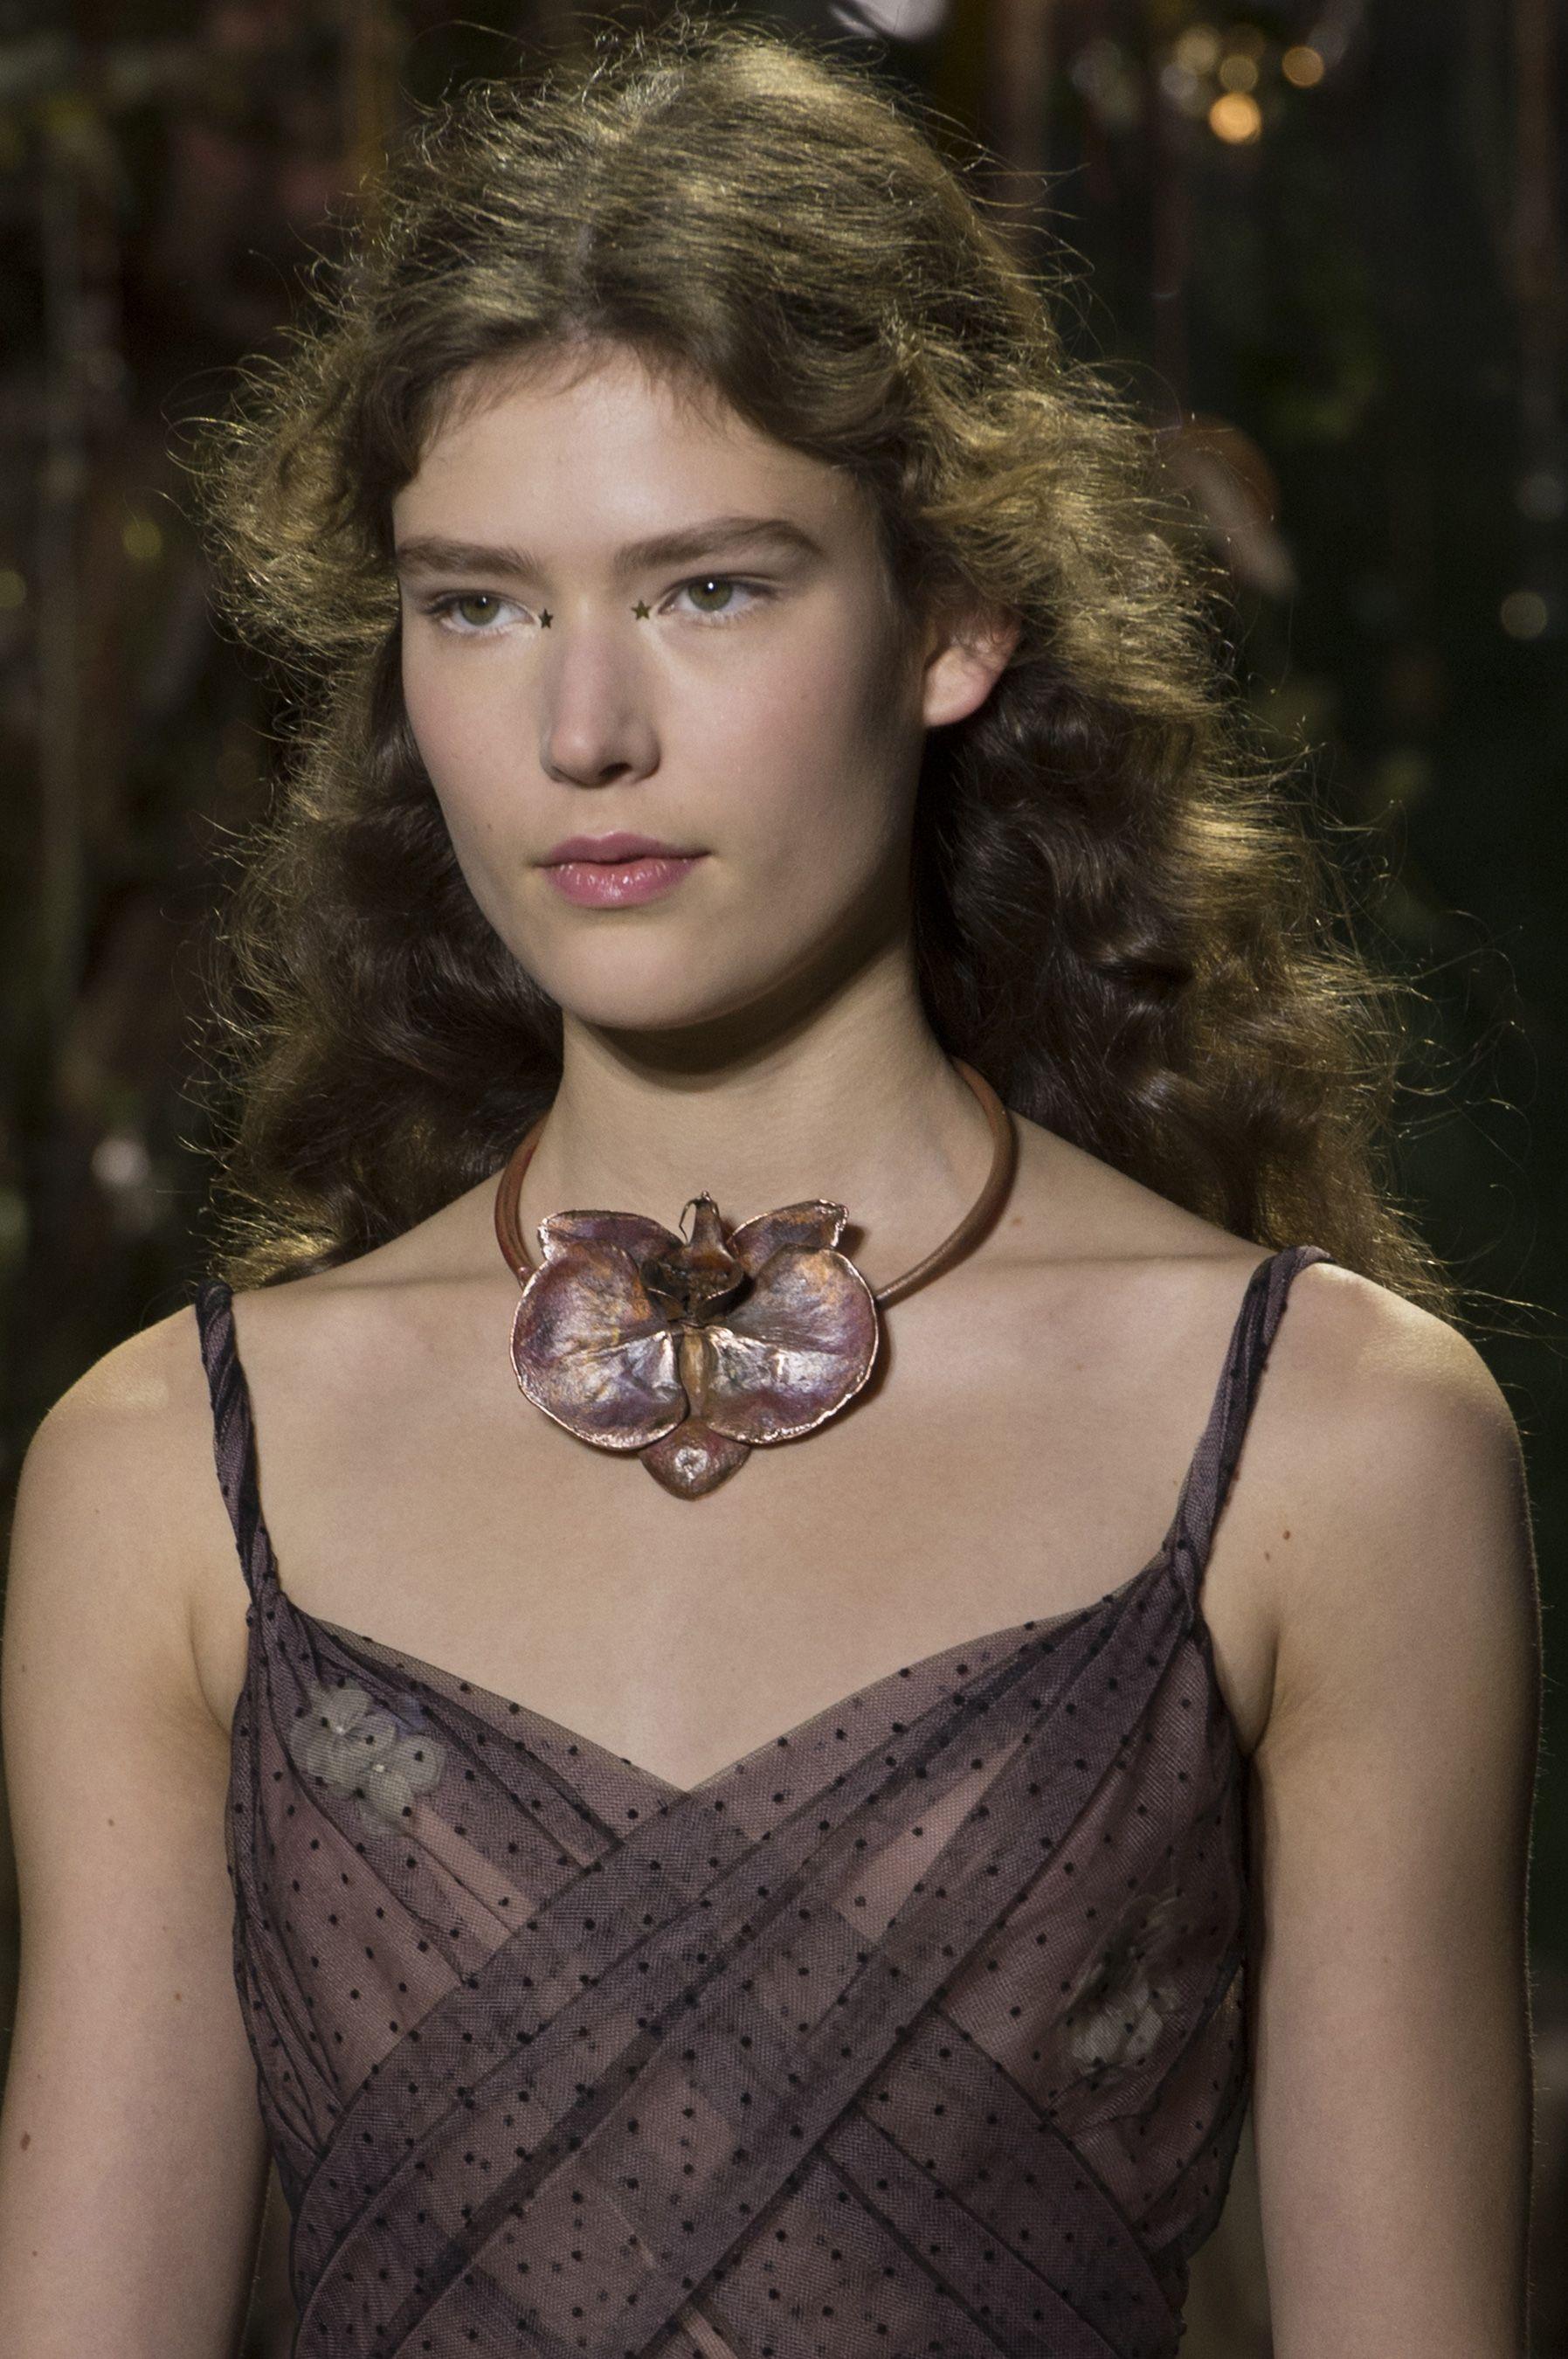 Christian Dior Spring 2017 Couture Fashion Show Details - The Impression